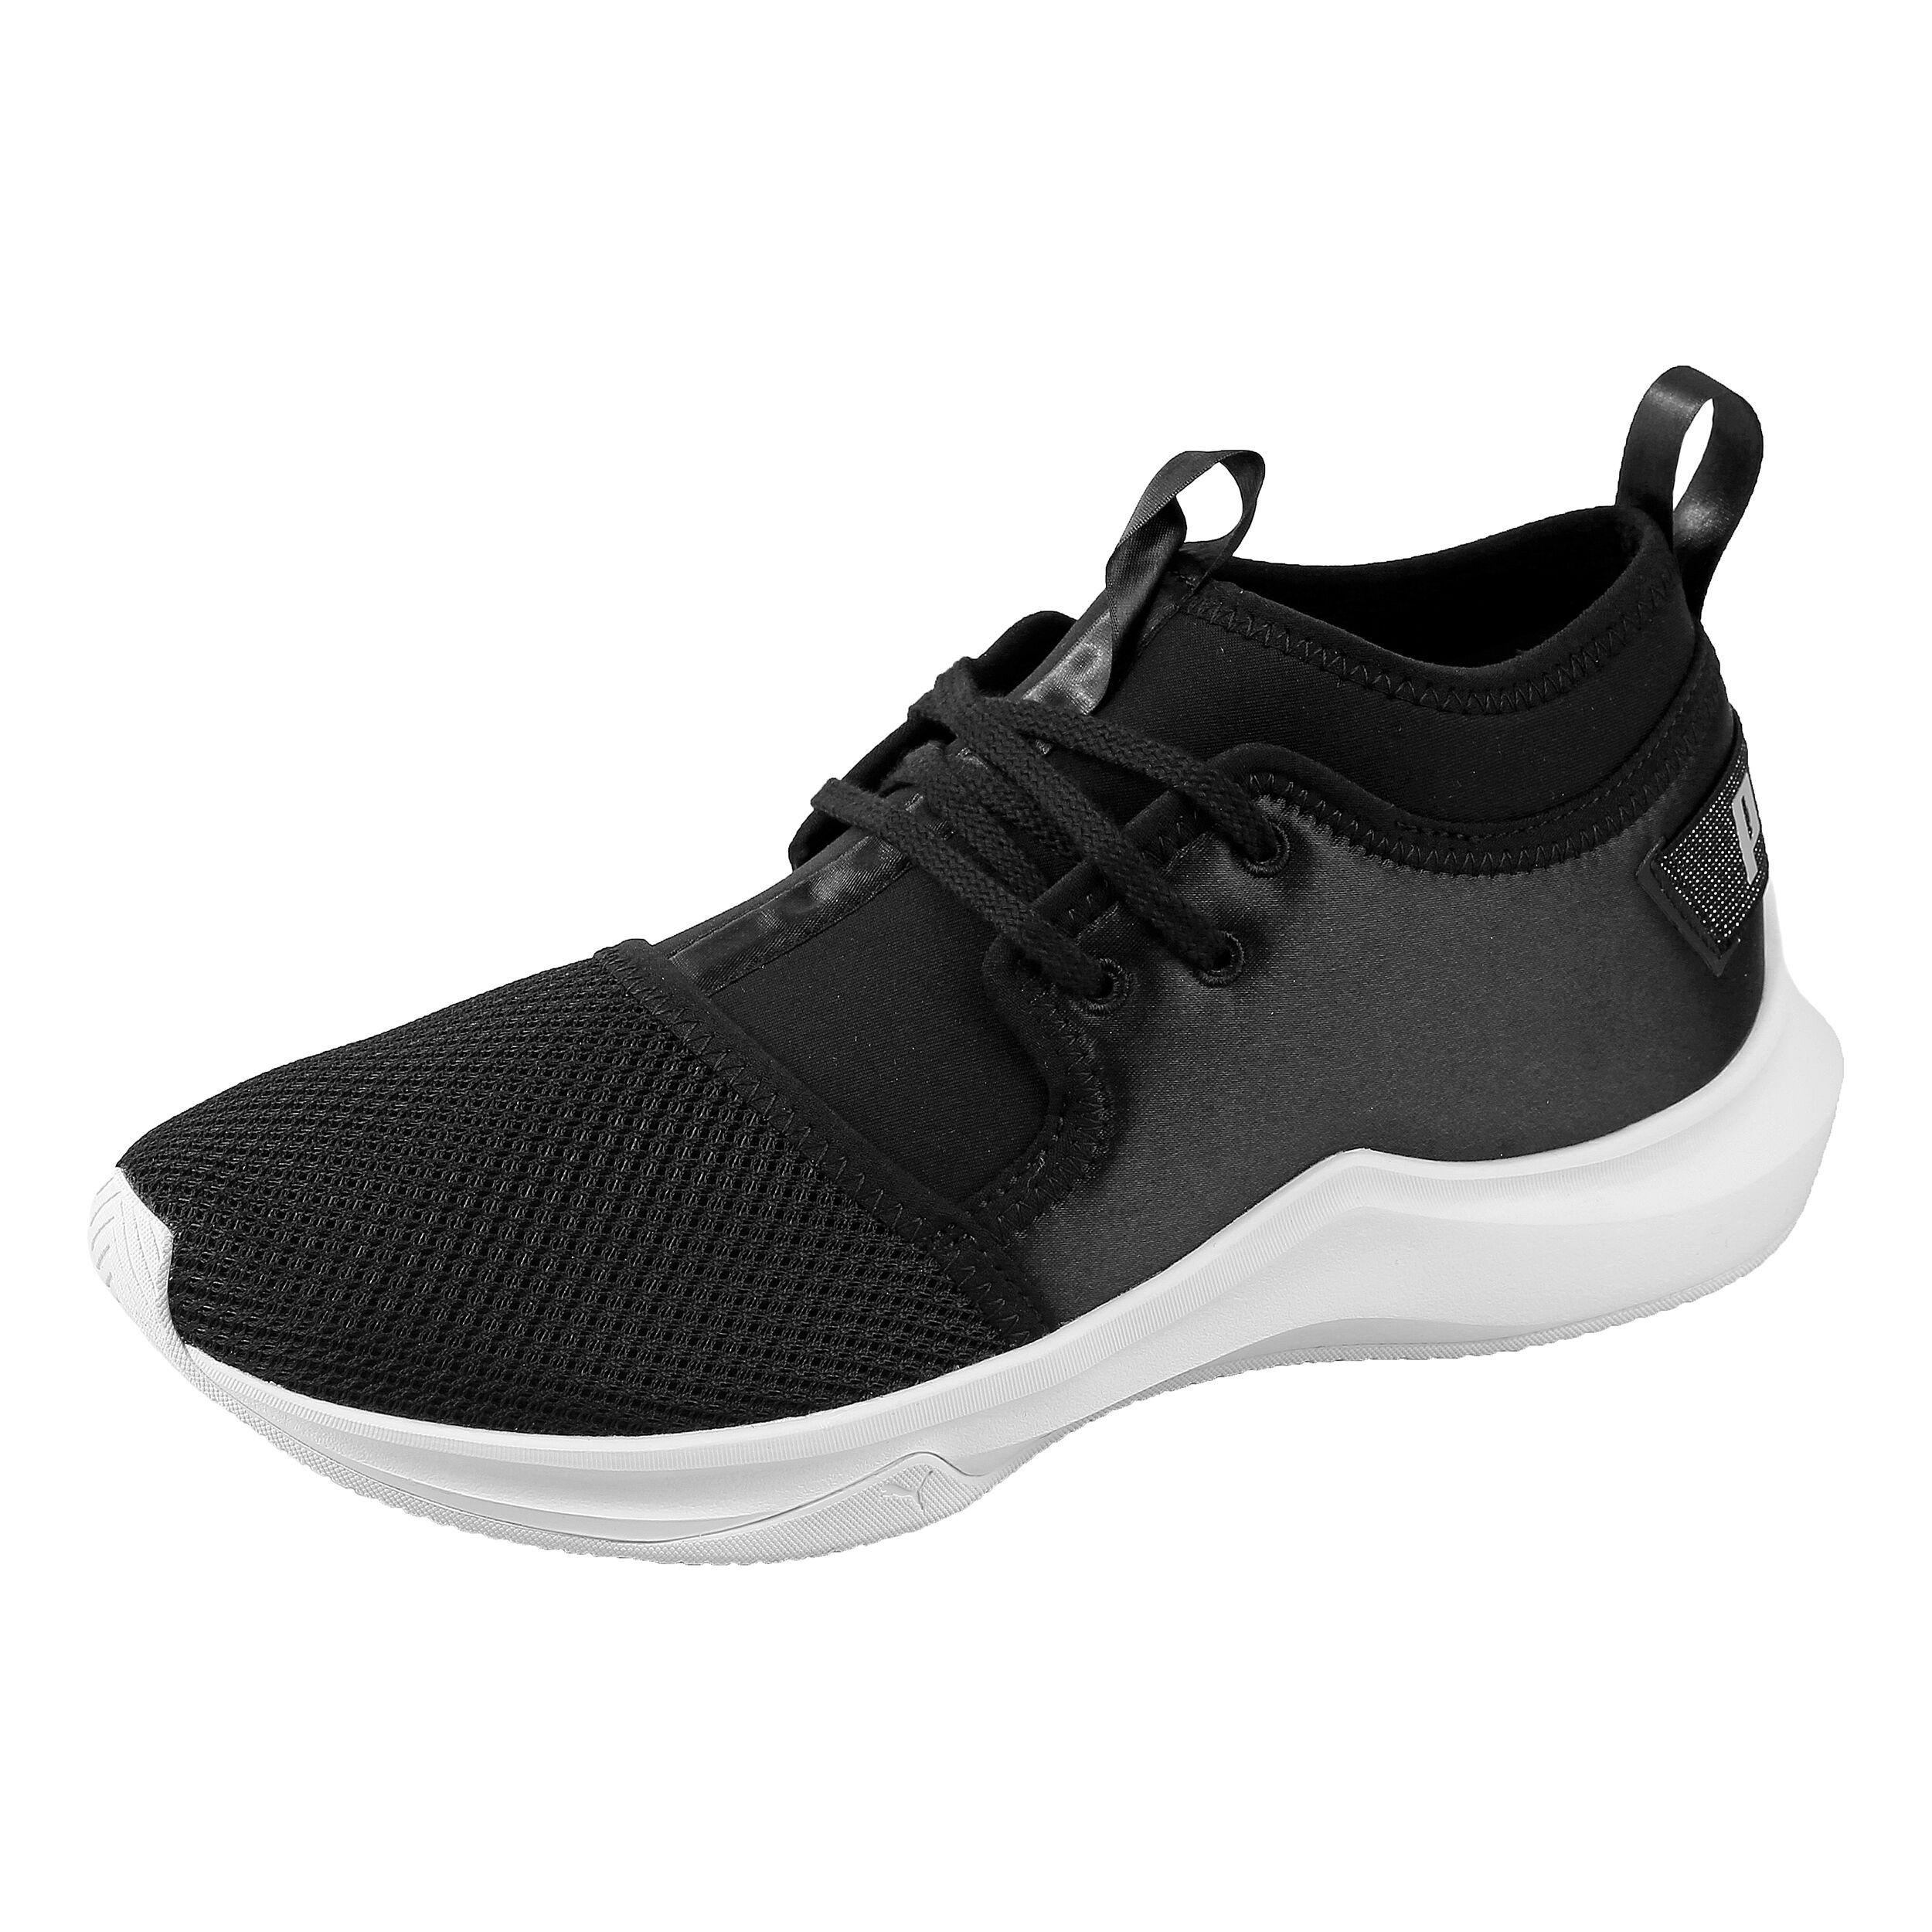 Puma Phenom Low Satin EP | Womens workout shoes, Womens